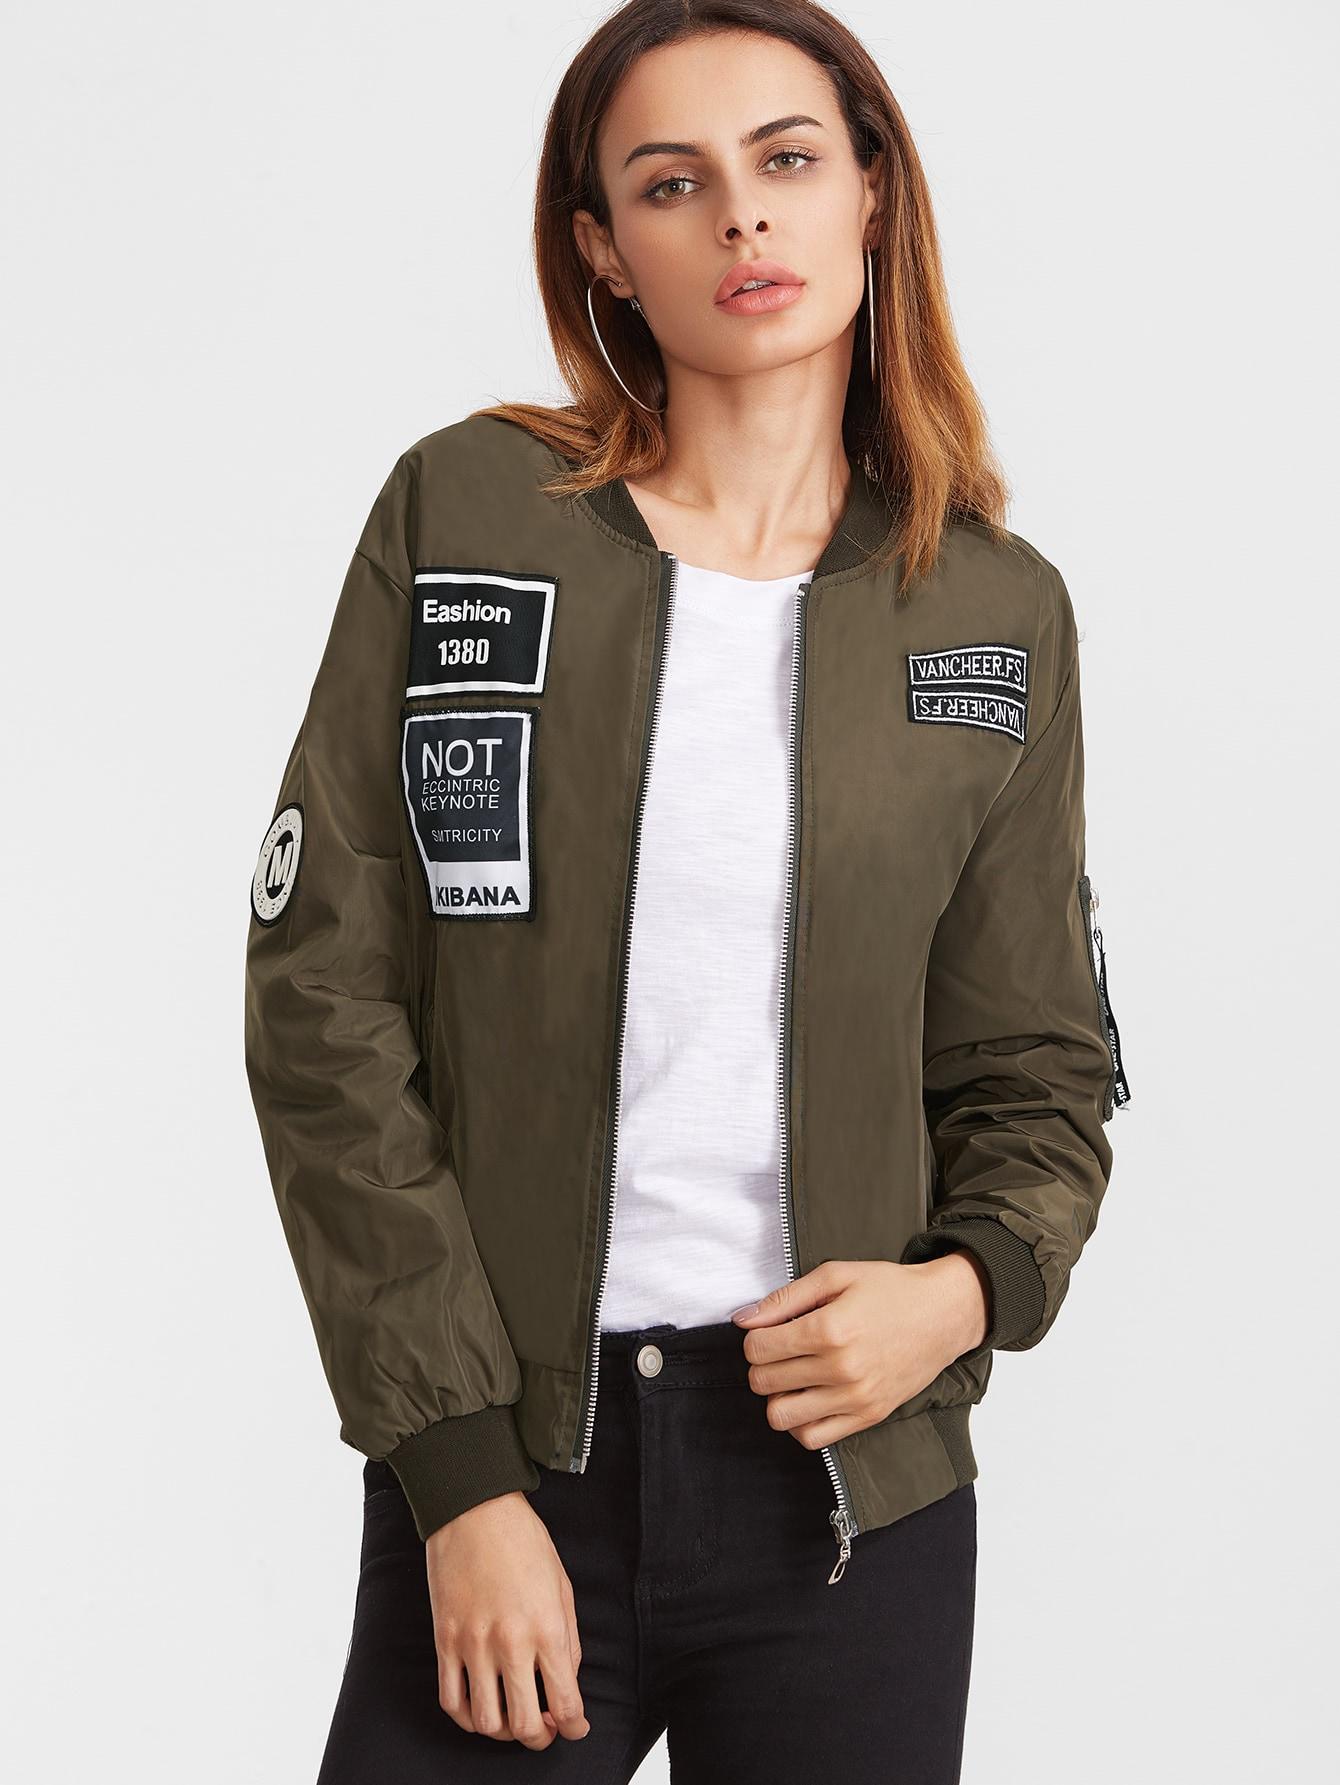 Embroidered Patch Zipper Flight Jacket